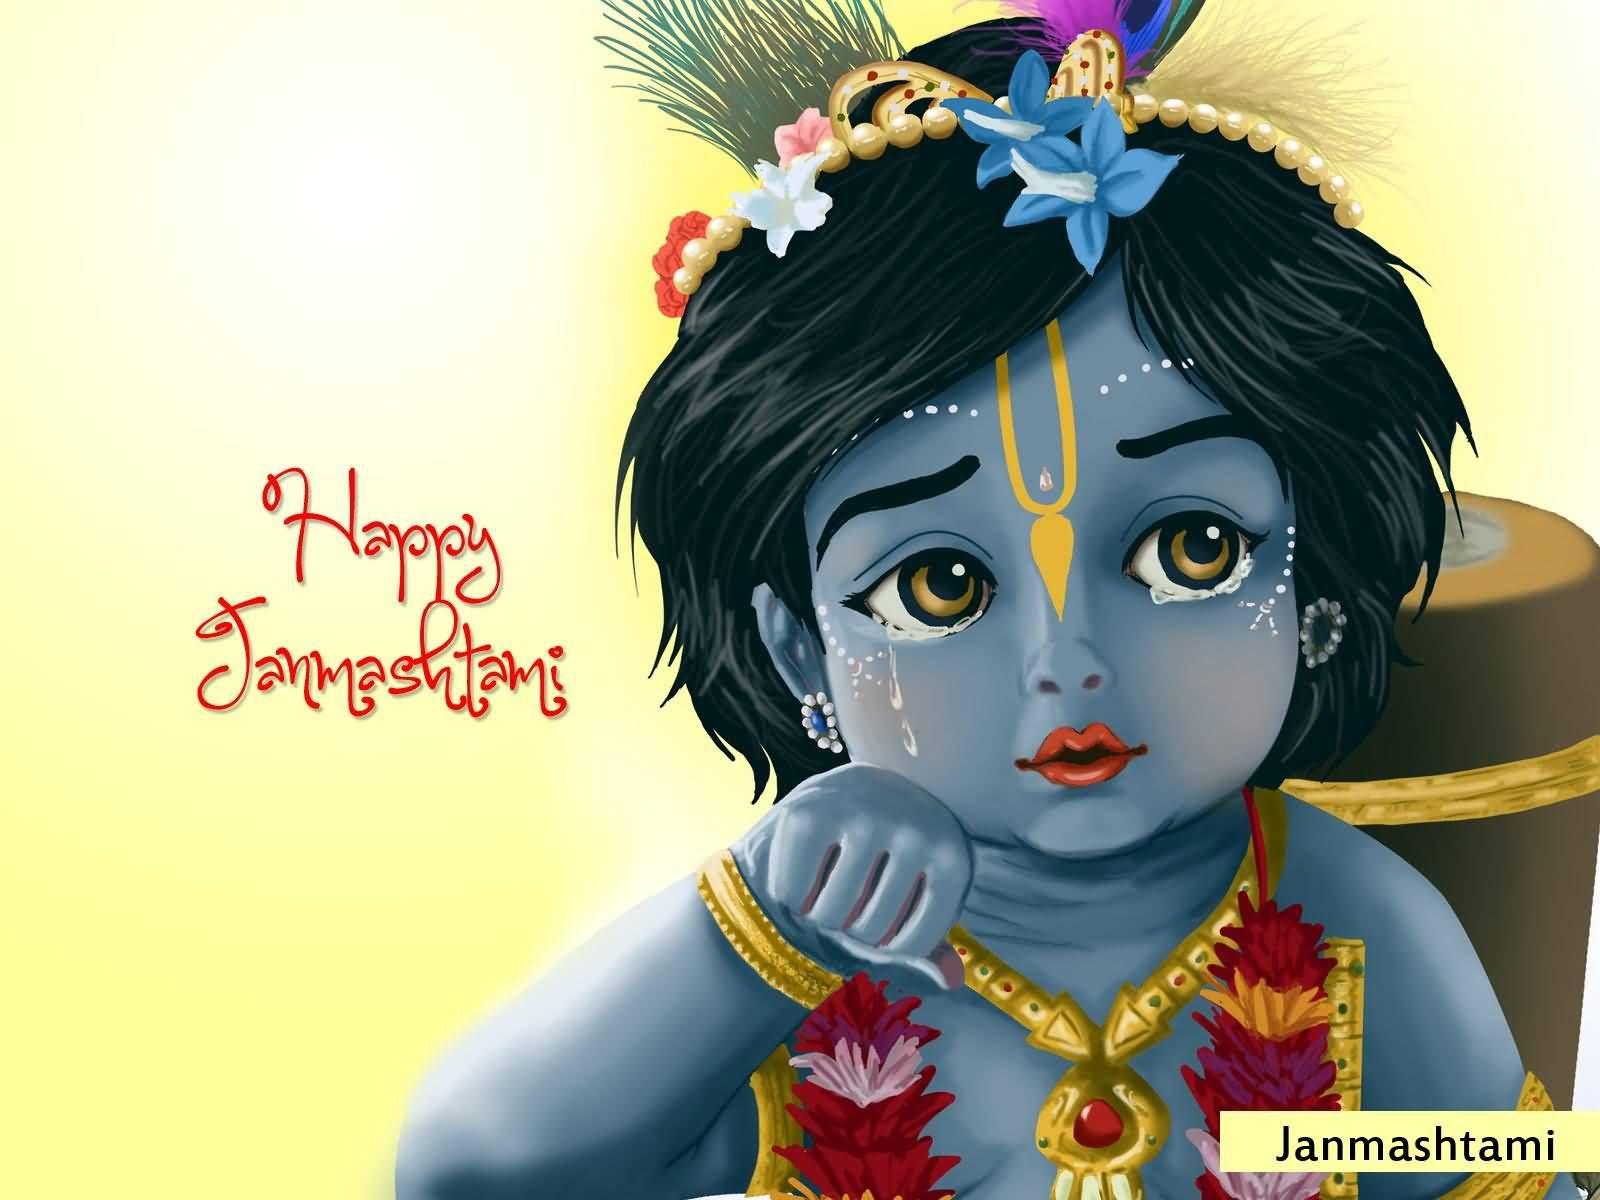 Wide Screen Wallpapers Best Bal Krishna Wallpapers Hd Download Janmashtami Wallpapers Happy Janmashtami Janmashtami Images